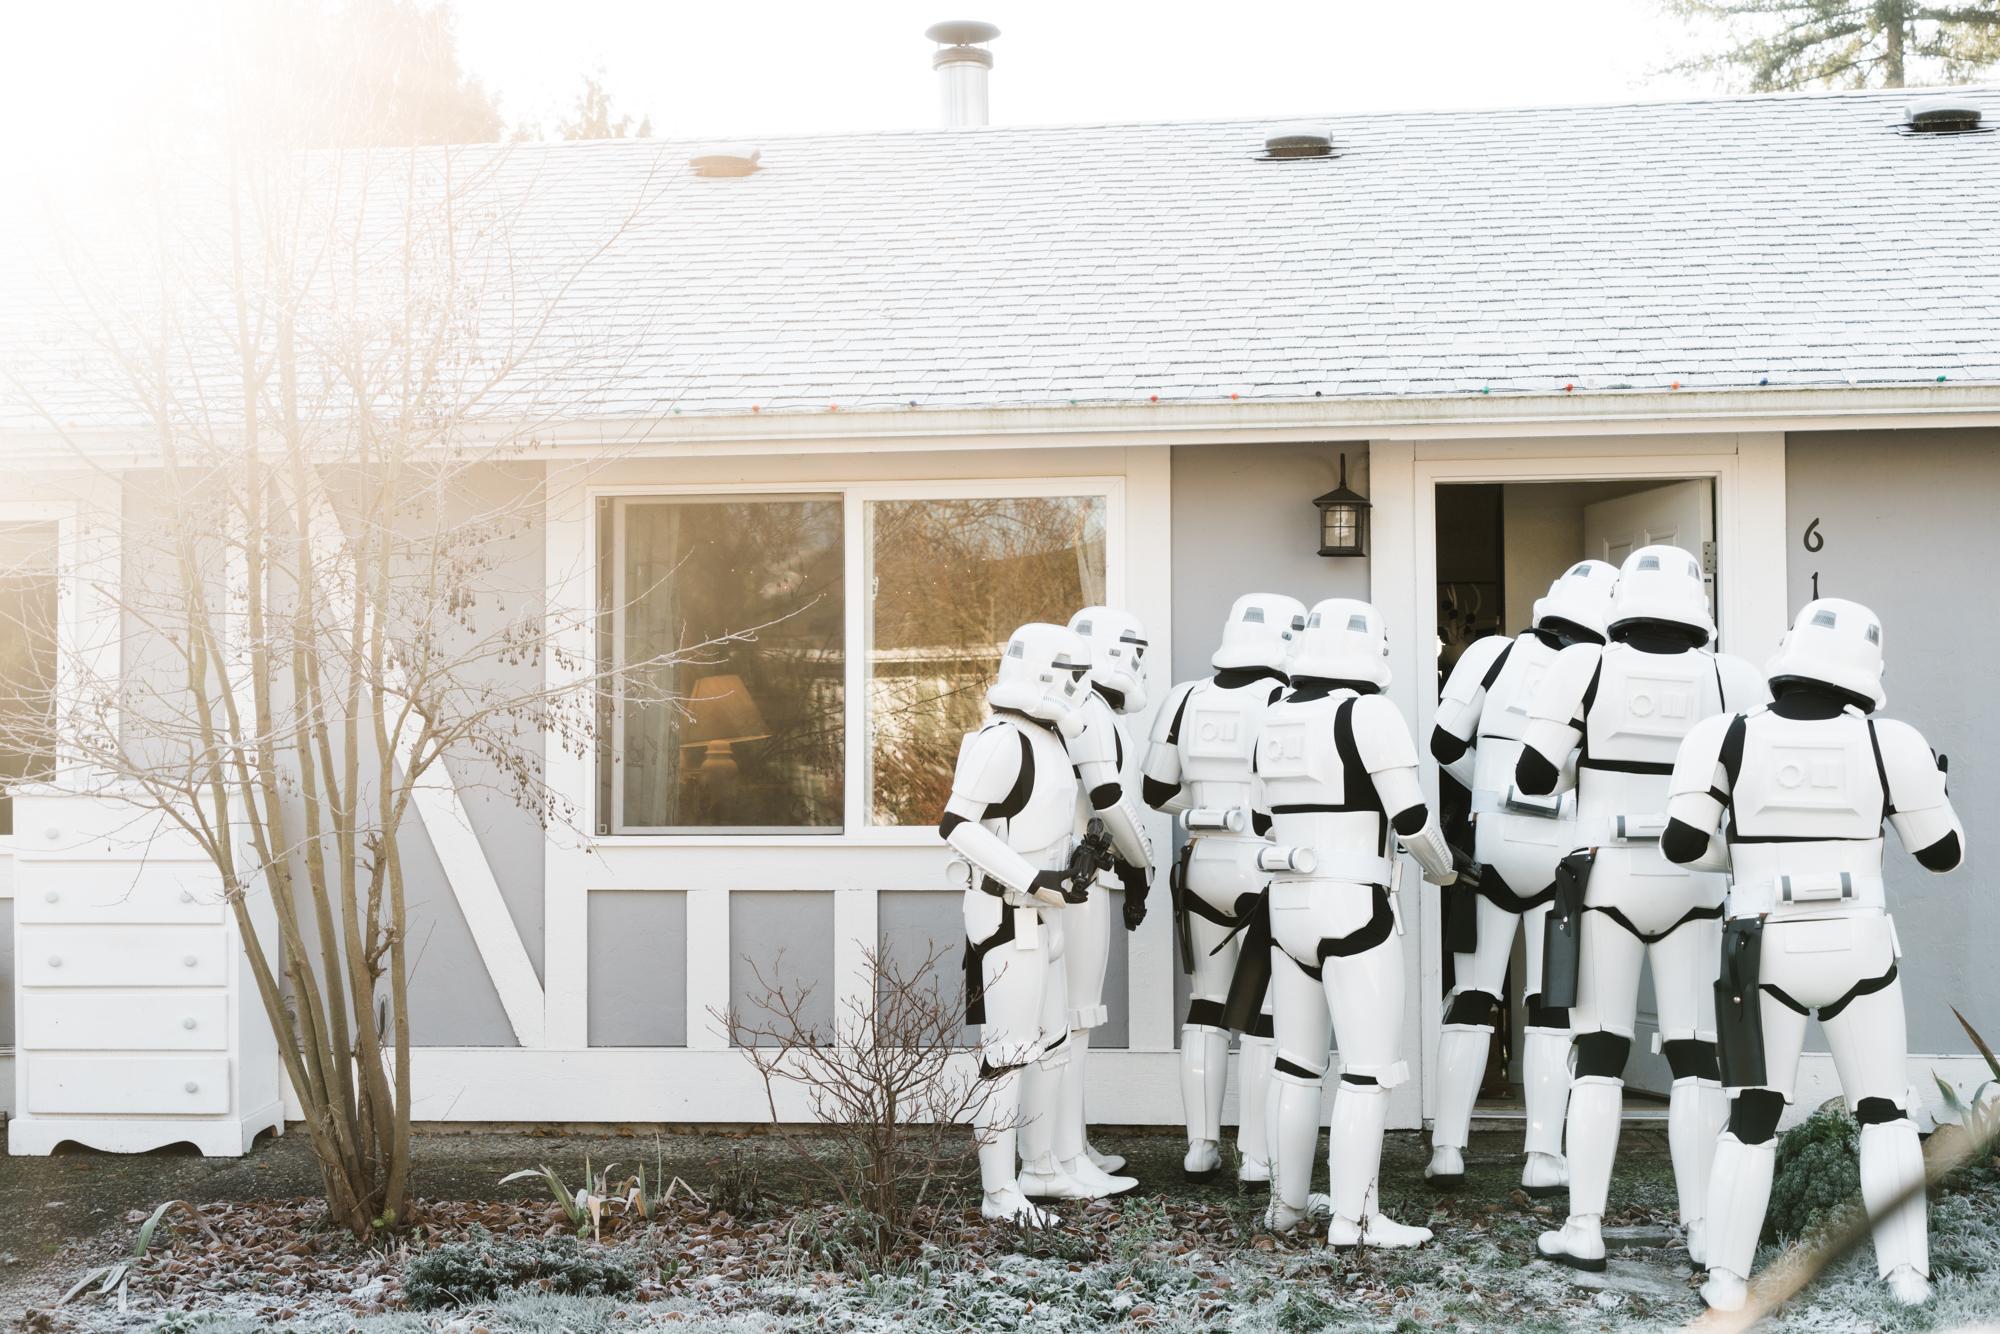 A Star Wars Holiday (Photo Story)-6.jpg